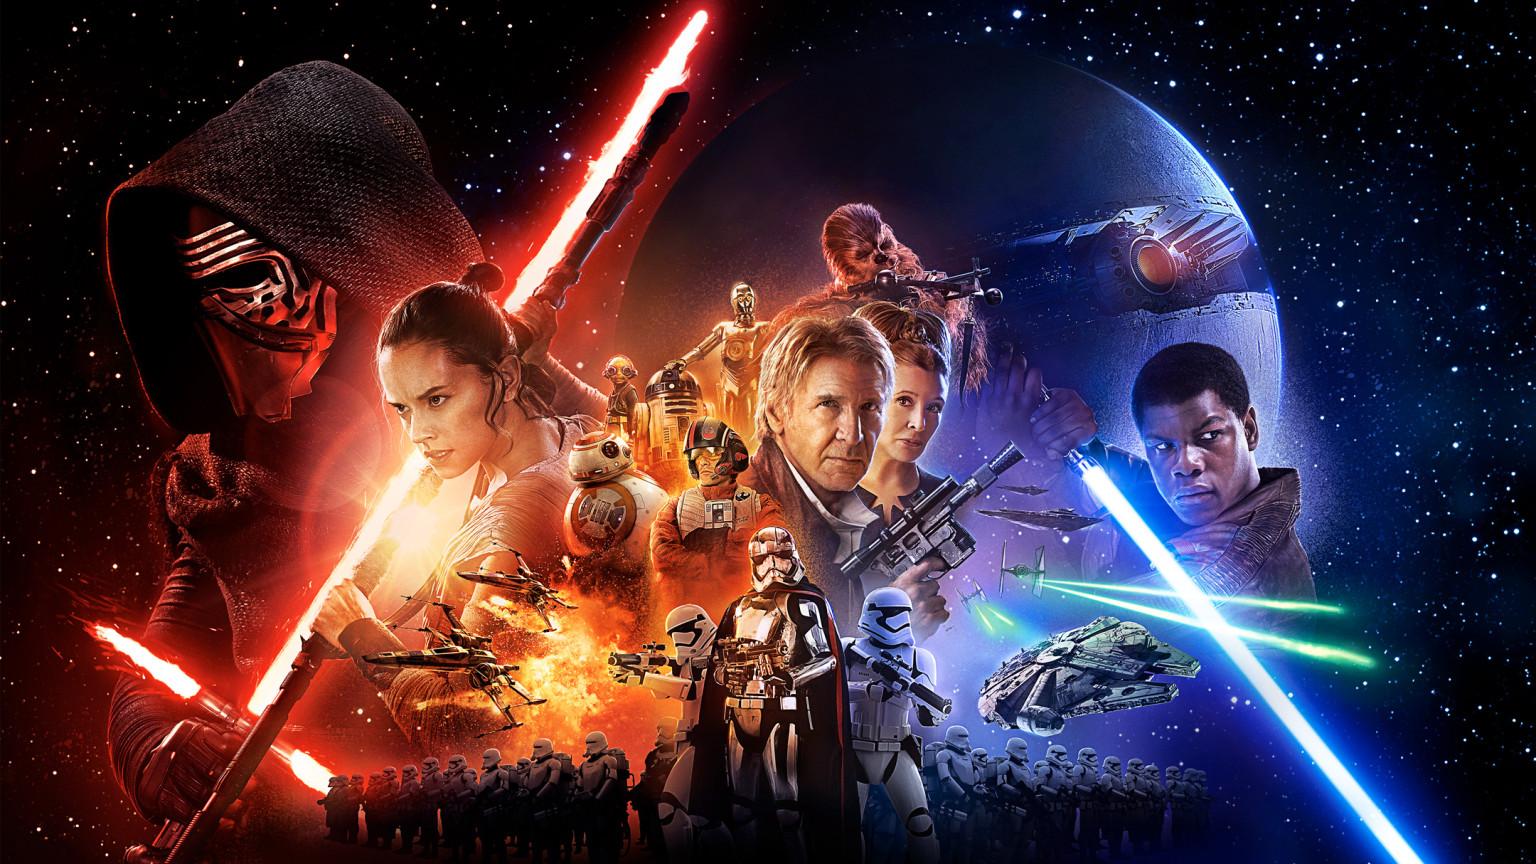 Star Wars: The Force Awakens - (2016)